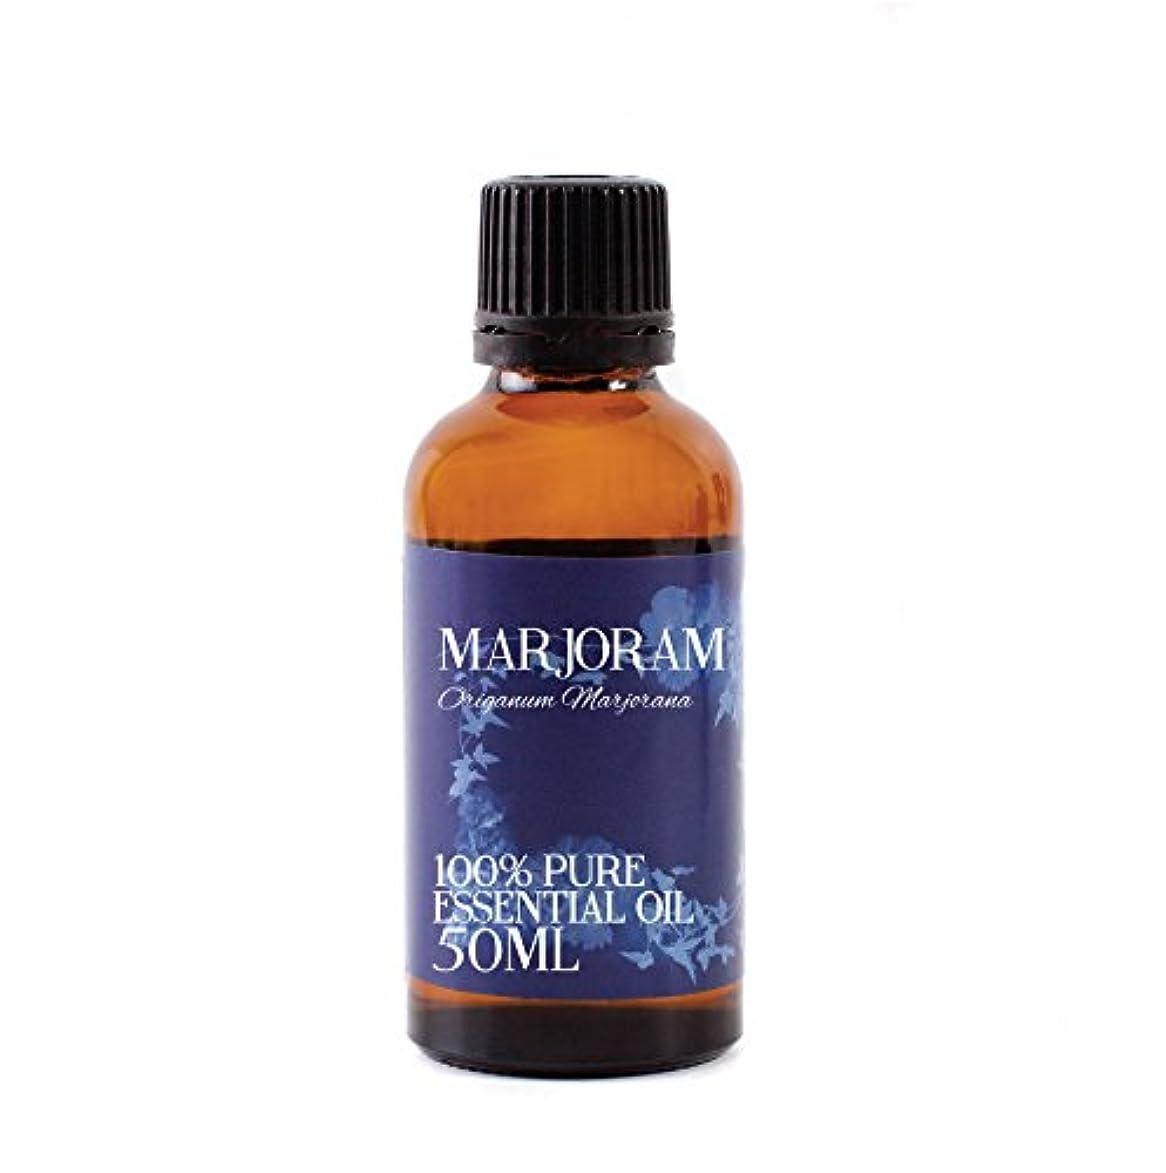 Mystic Moments | Marjoram Essential Oil - 50ml - 100% Pure